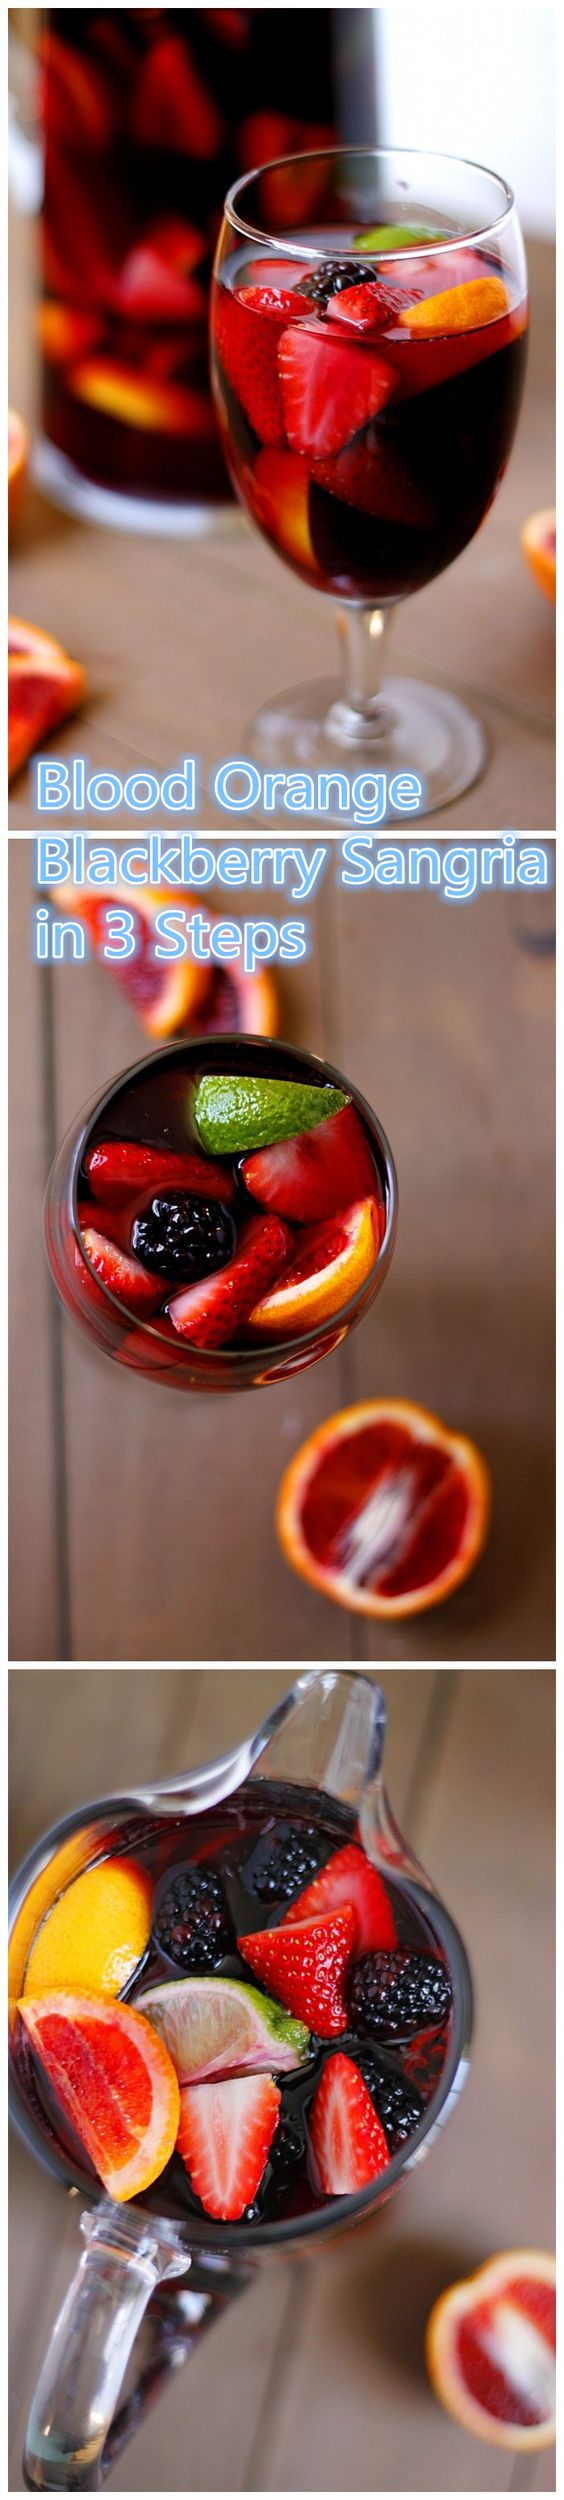 Blood Orange Blackberry Sangria in 3 Steps. Make it at home tonight!